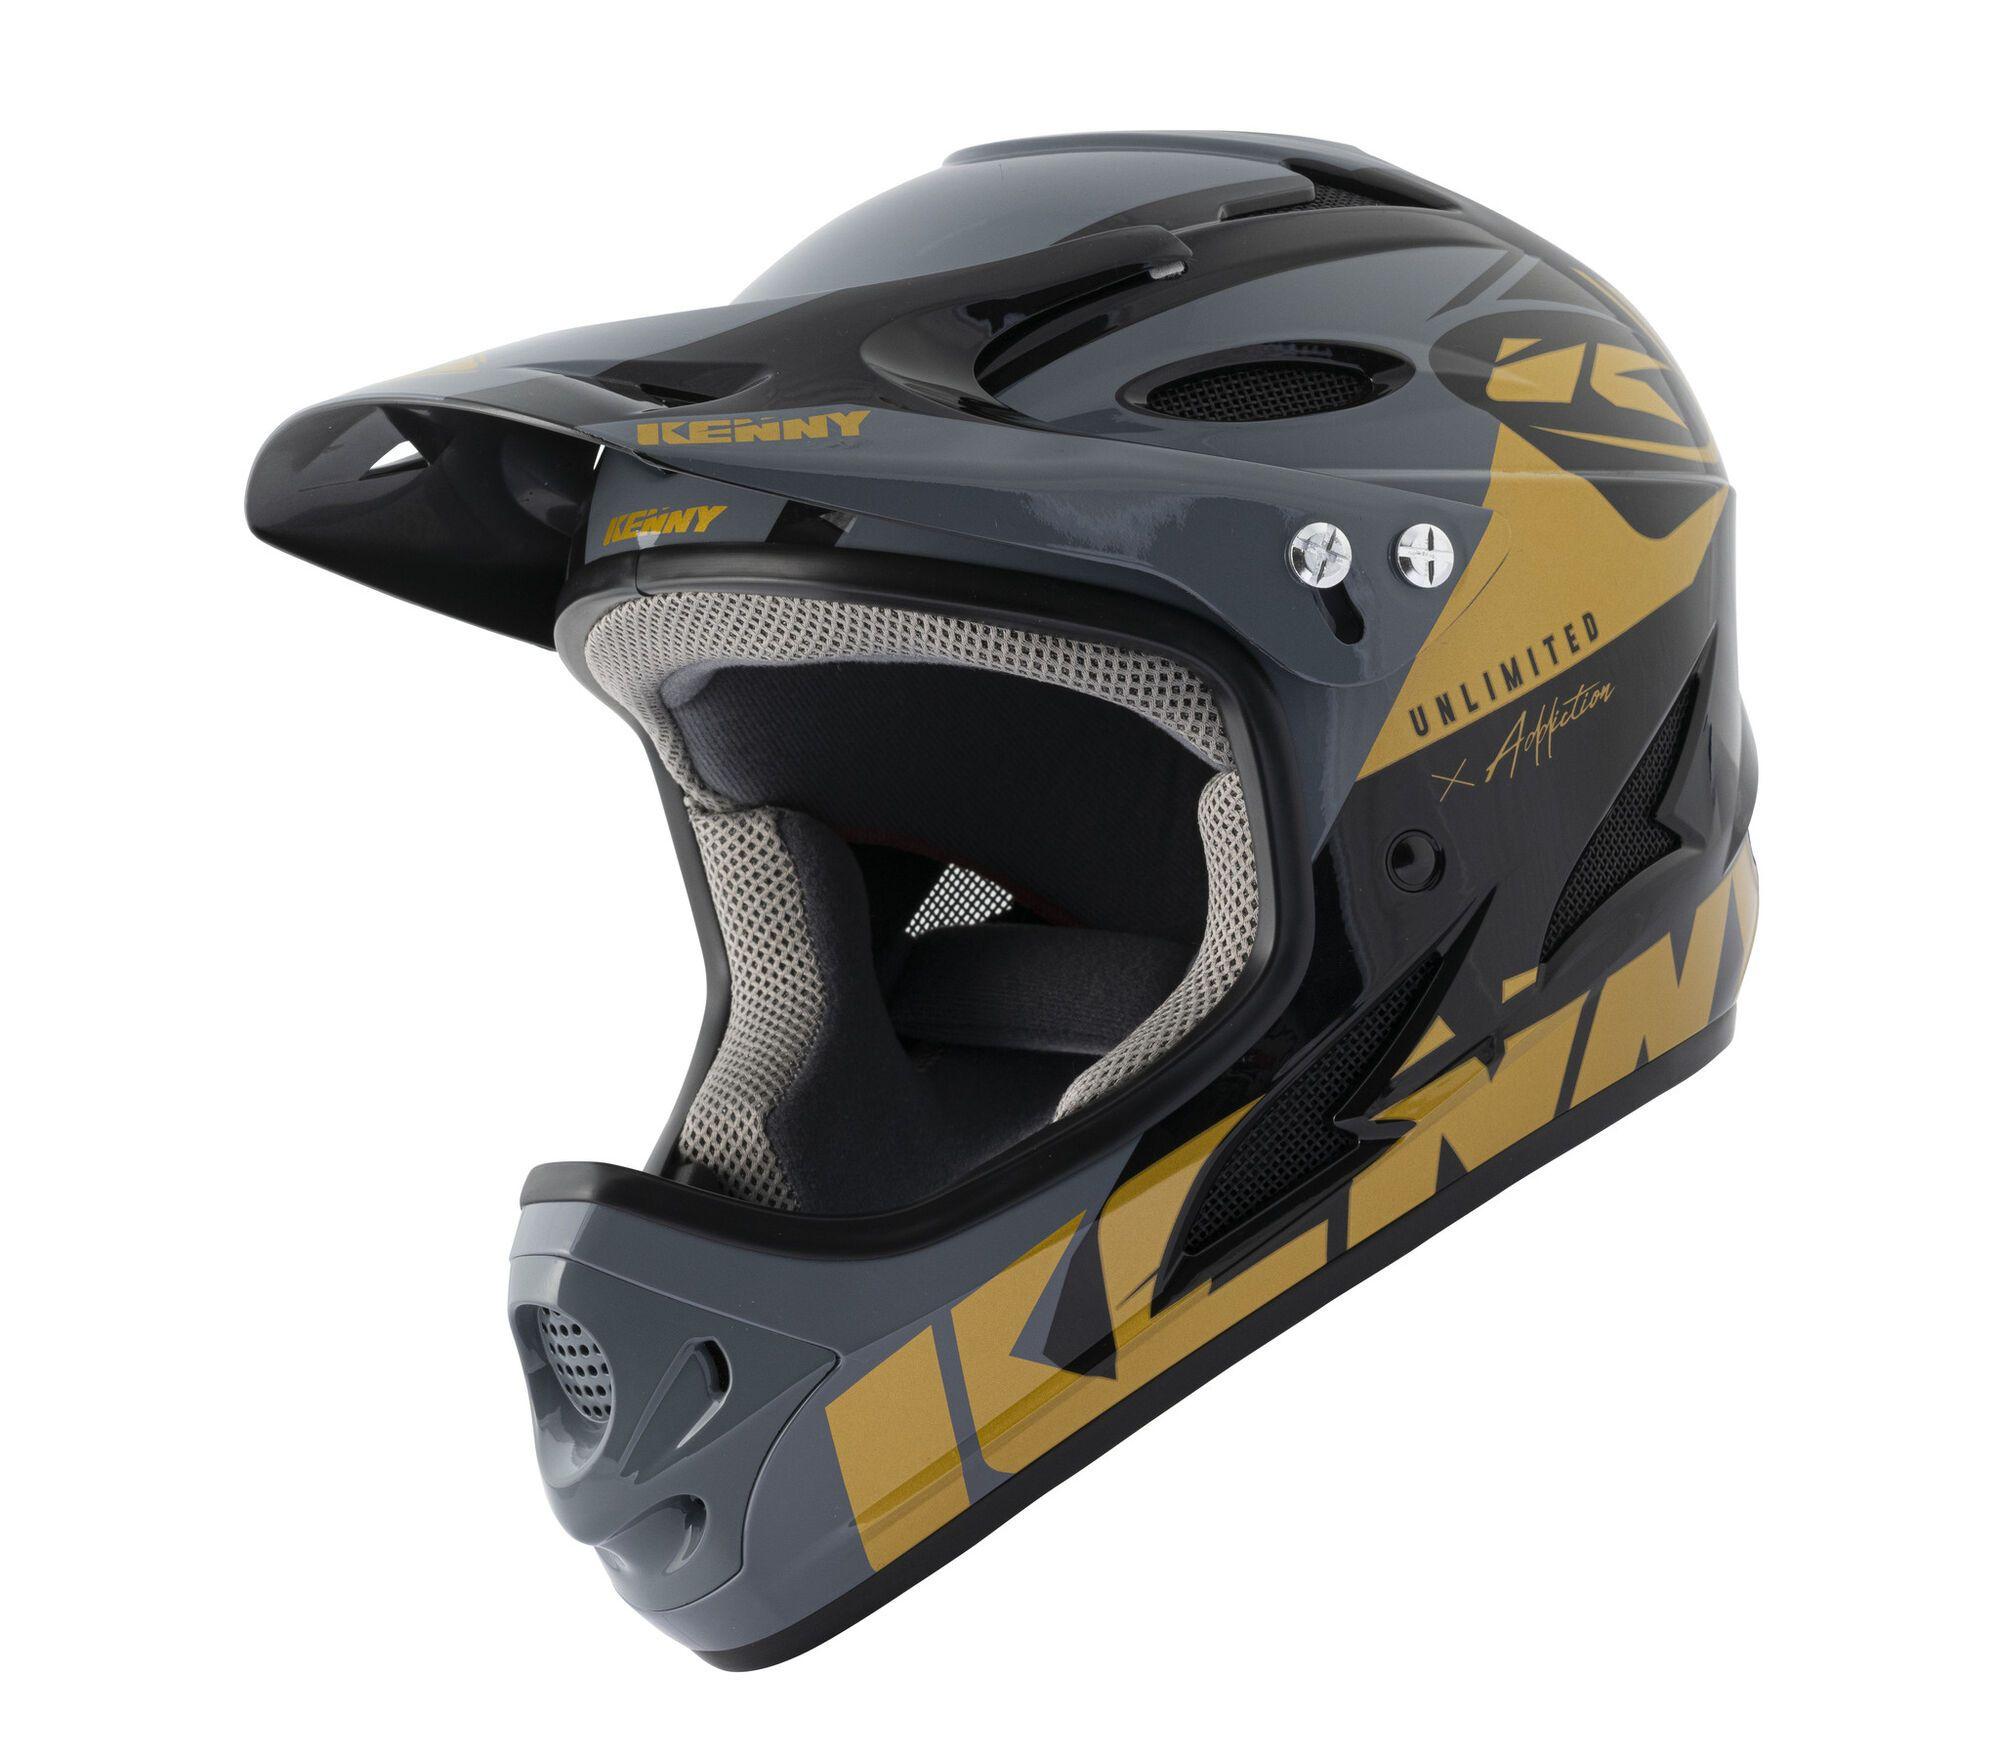 Kenny BMX Helm Downhill Black/Gold